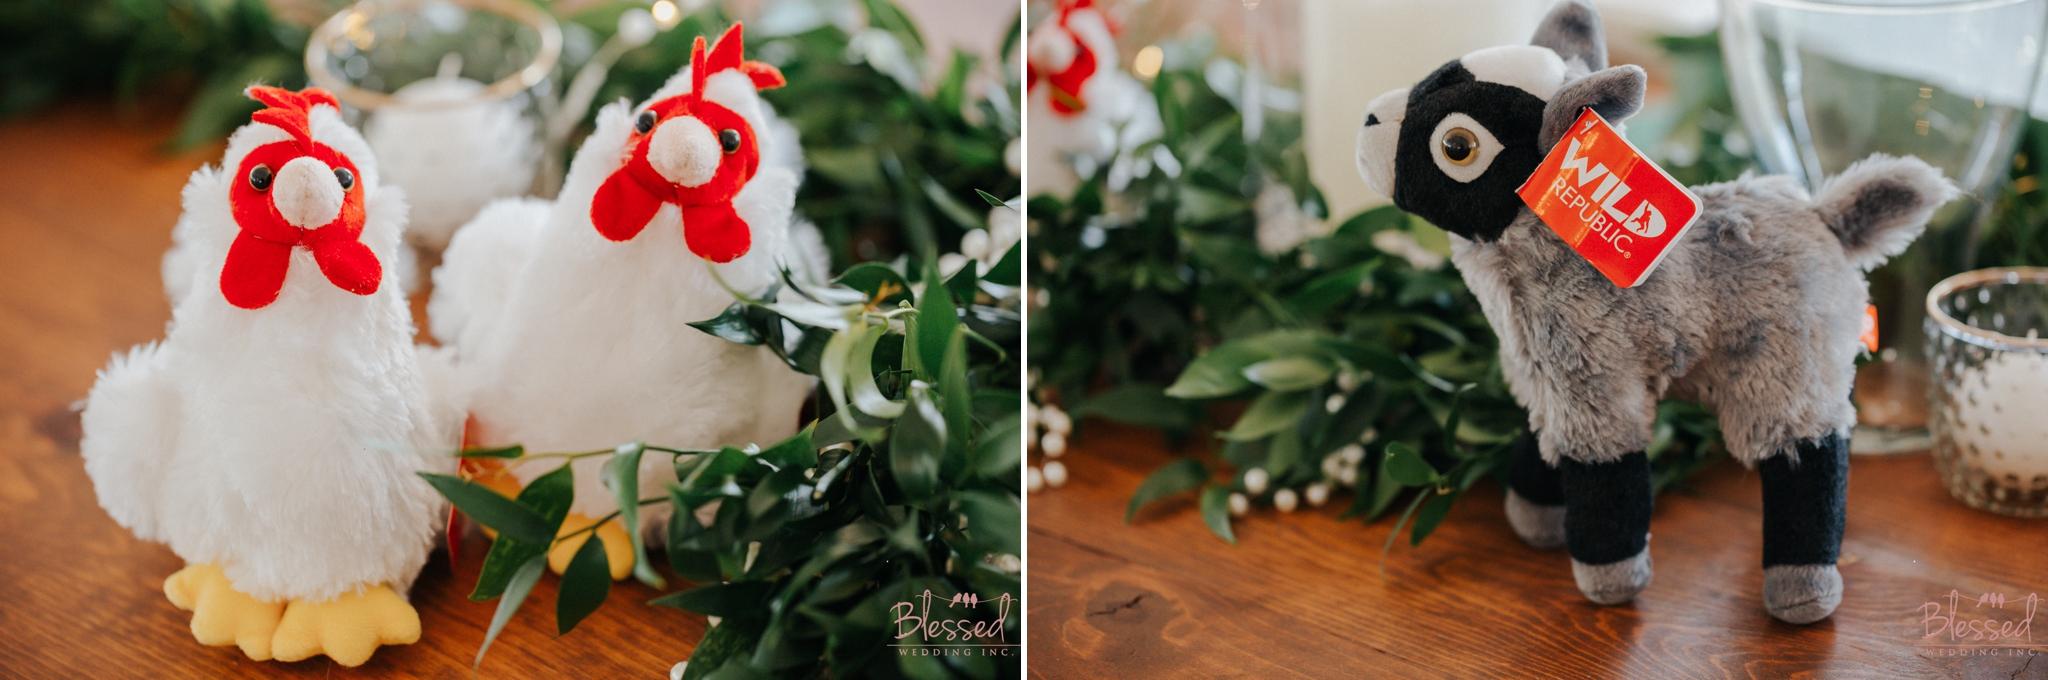 Orfila Vinery Wedding by Blessed Wedding Photography 36.jpg